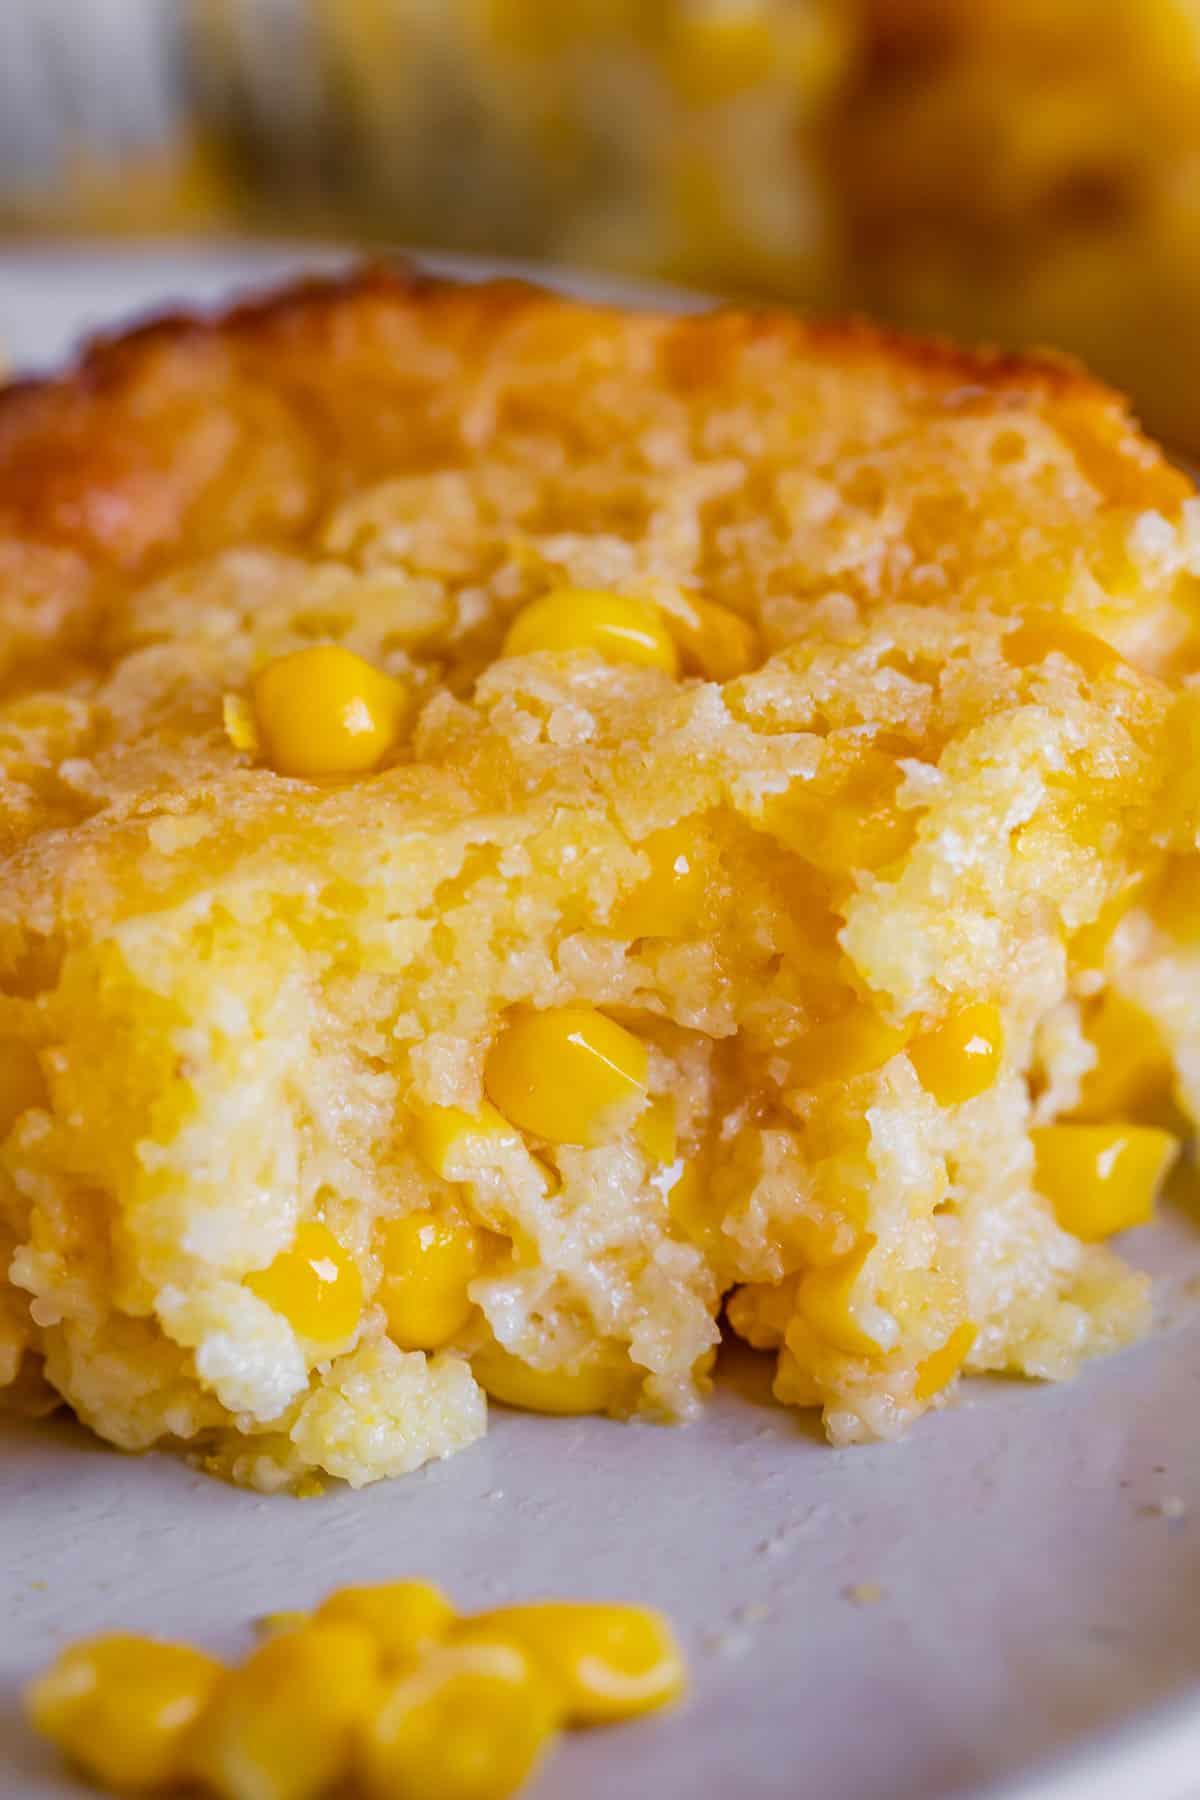 Sweet Creamed Corn Casserole With Jiffy Mix The Food Charlatan